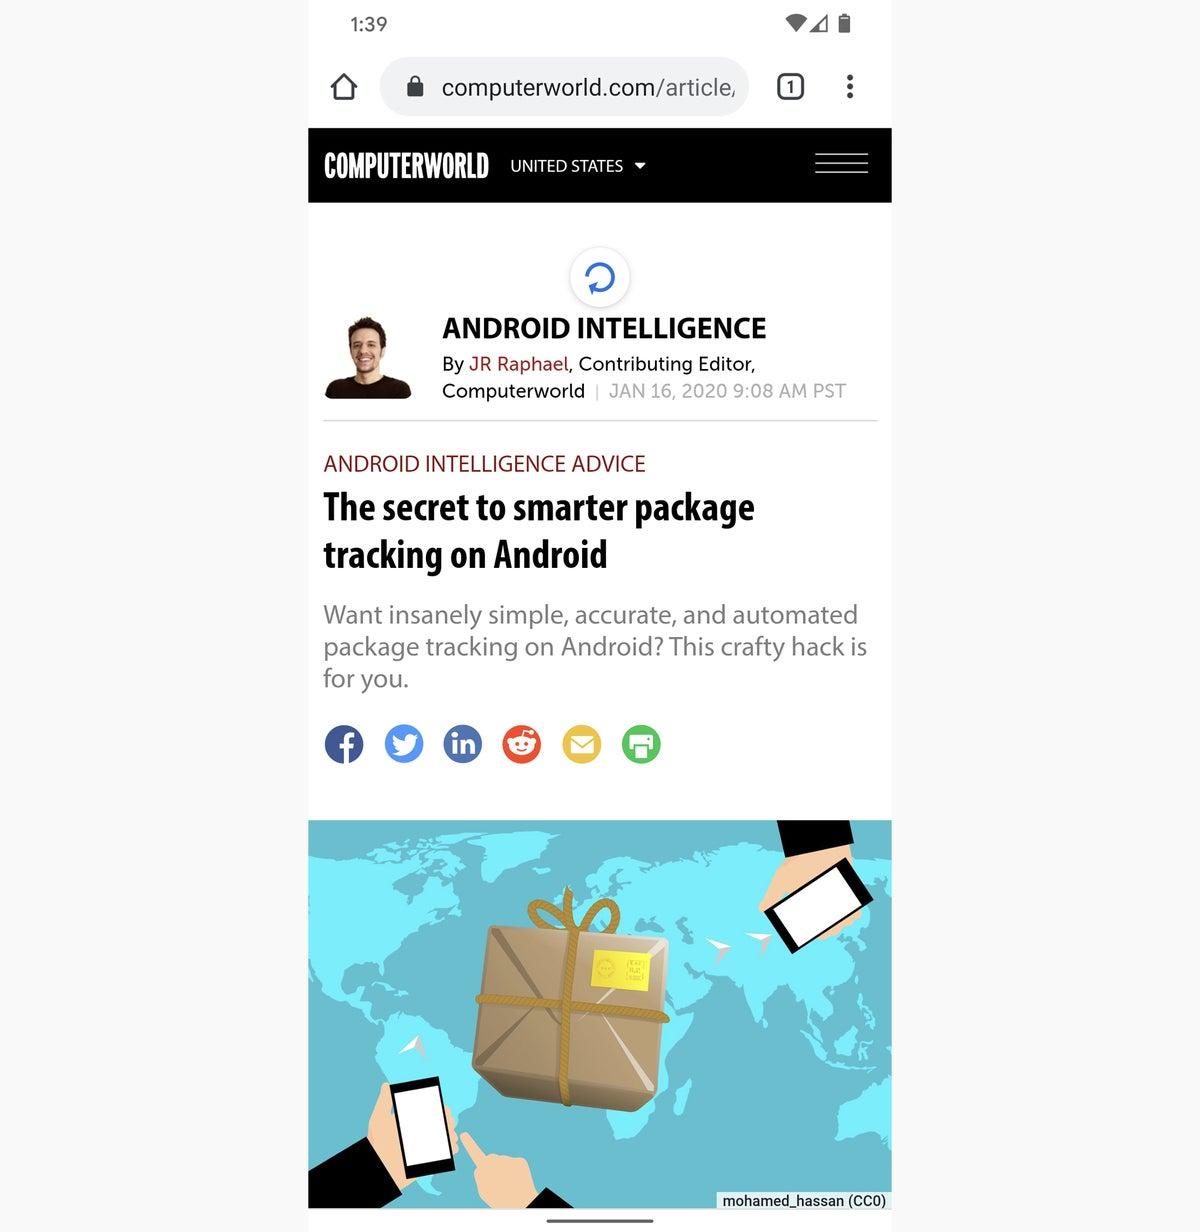 los atajos de Android actualizan Chrome 2020